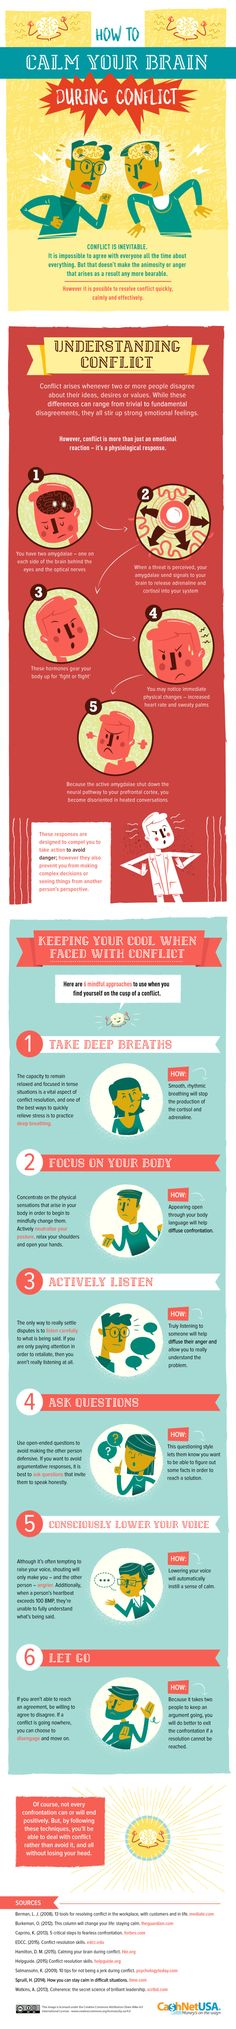 how-to-calm-brain-V2.jpg